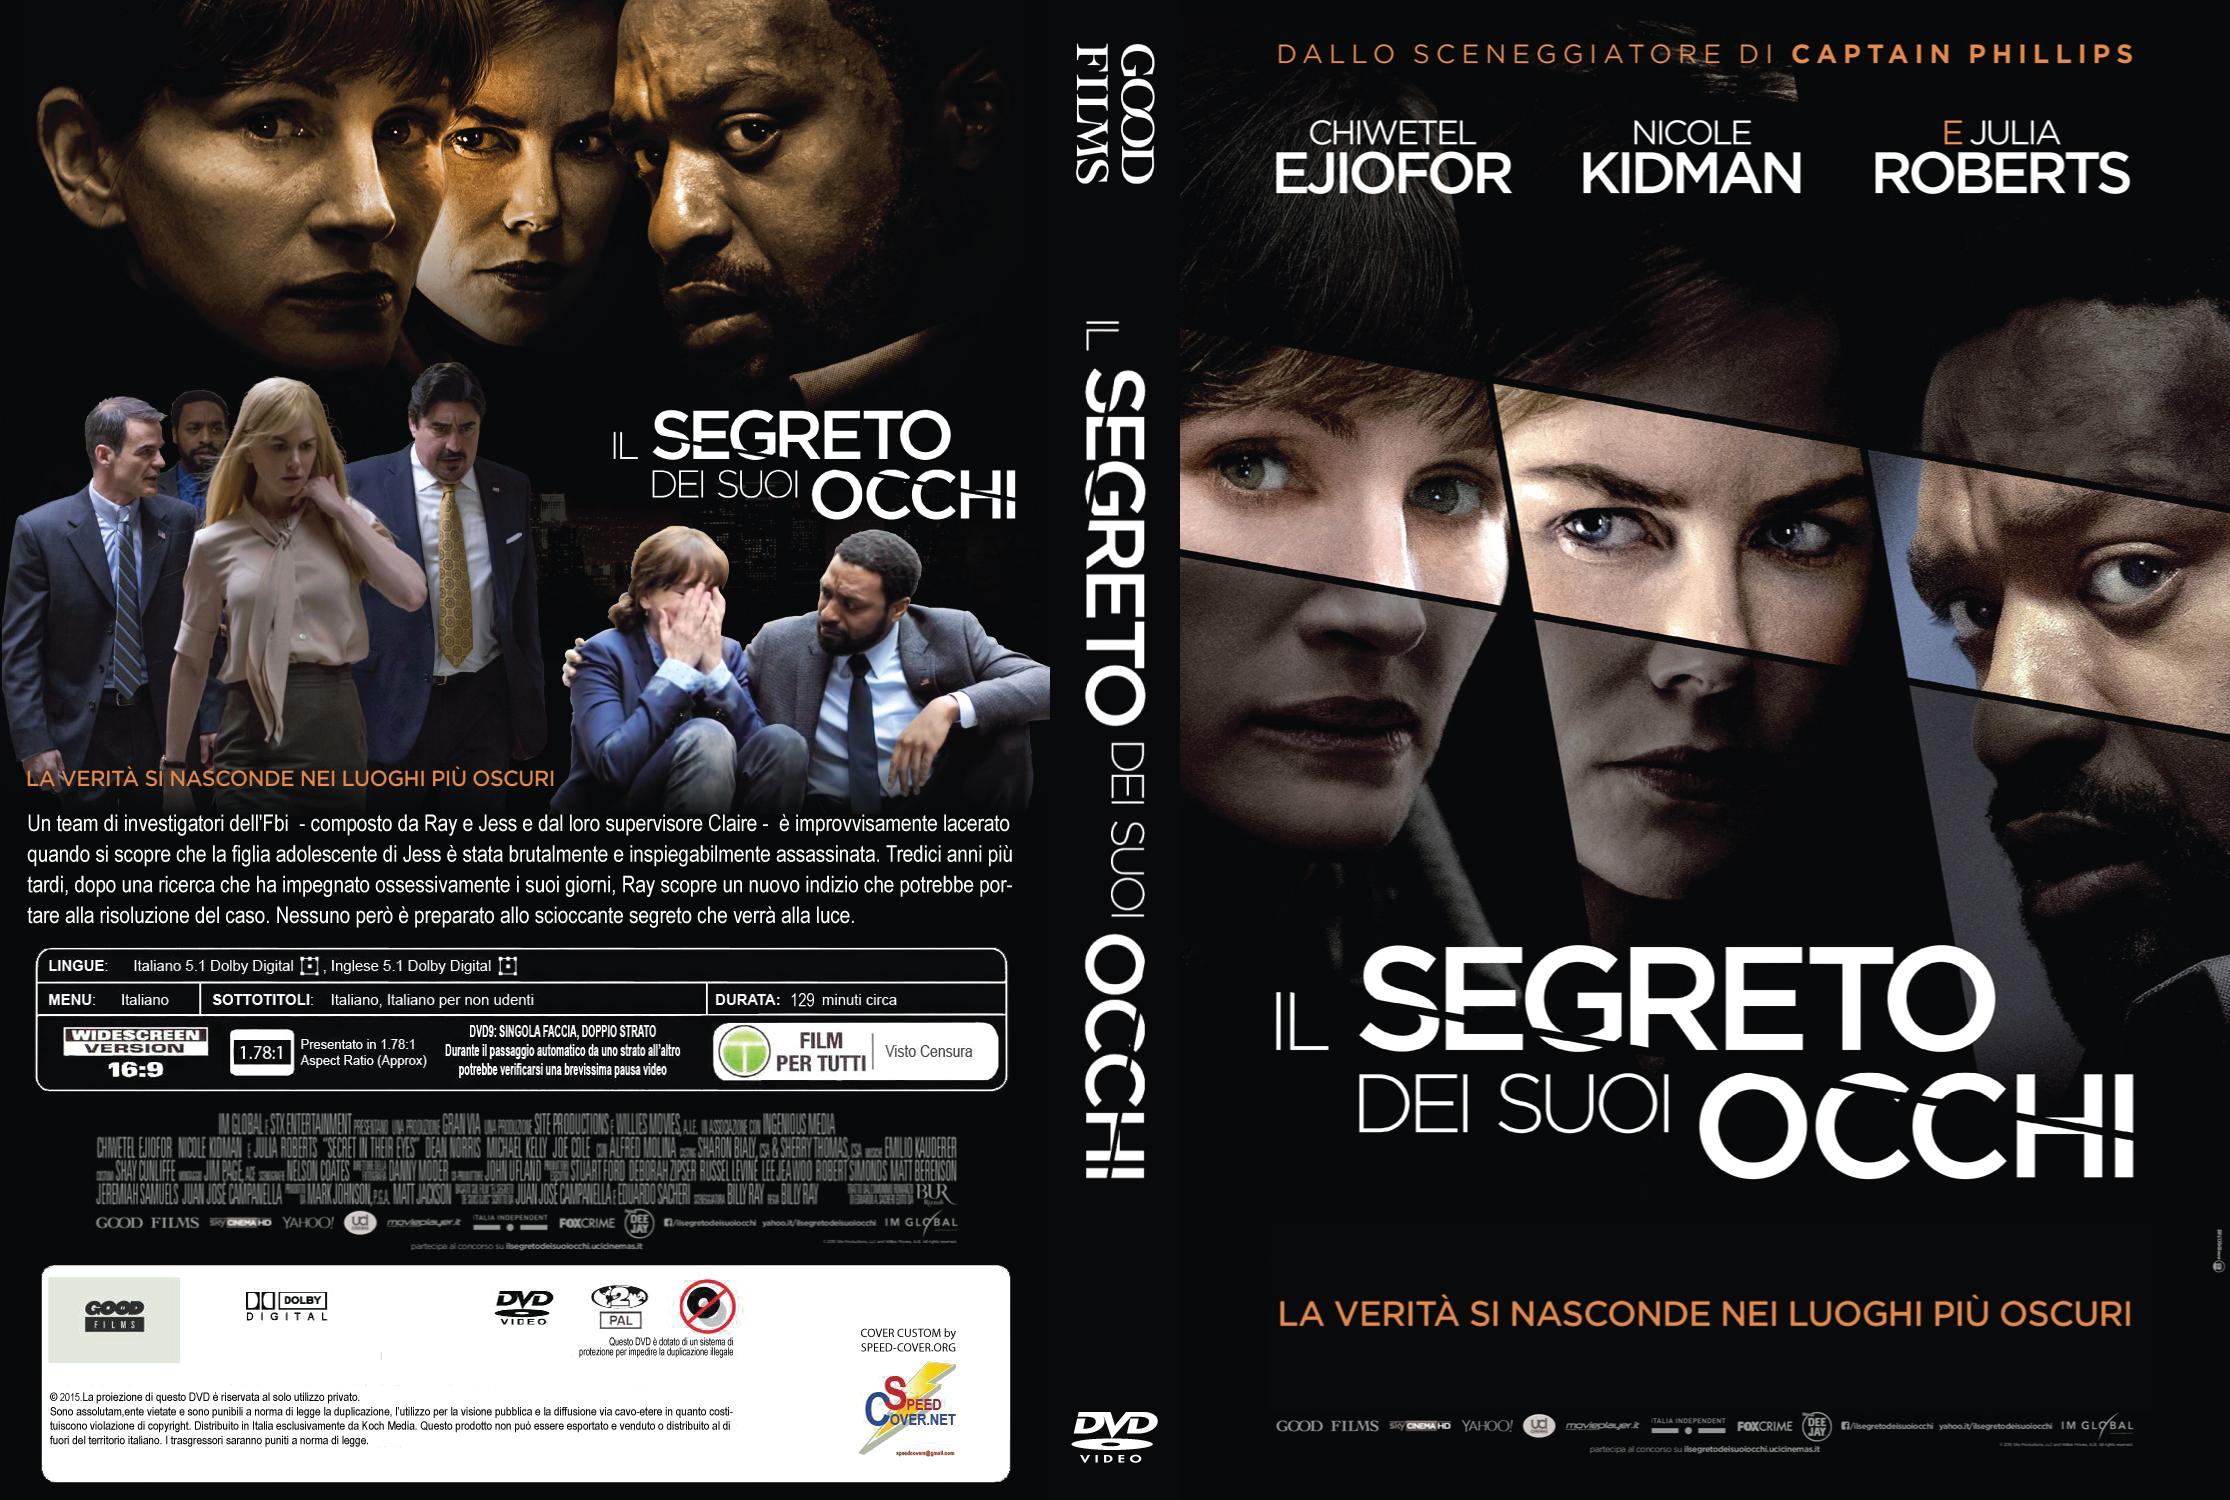 Videonoleggio vendita ilsegreto dei suoi occhi 2015 - Il giardino segreto dvd vendita ...